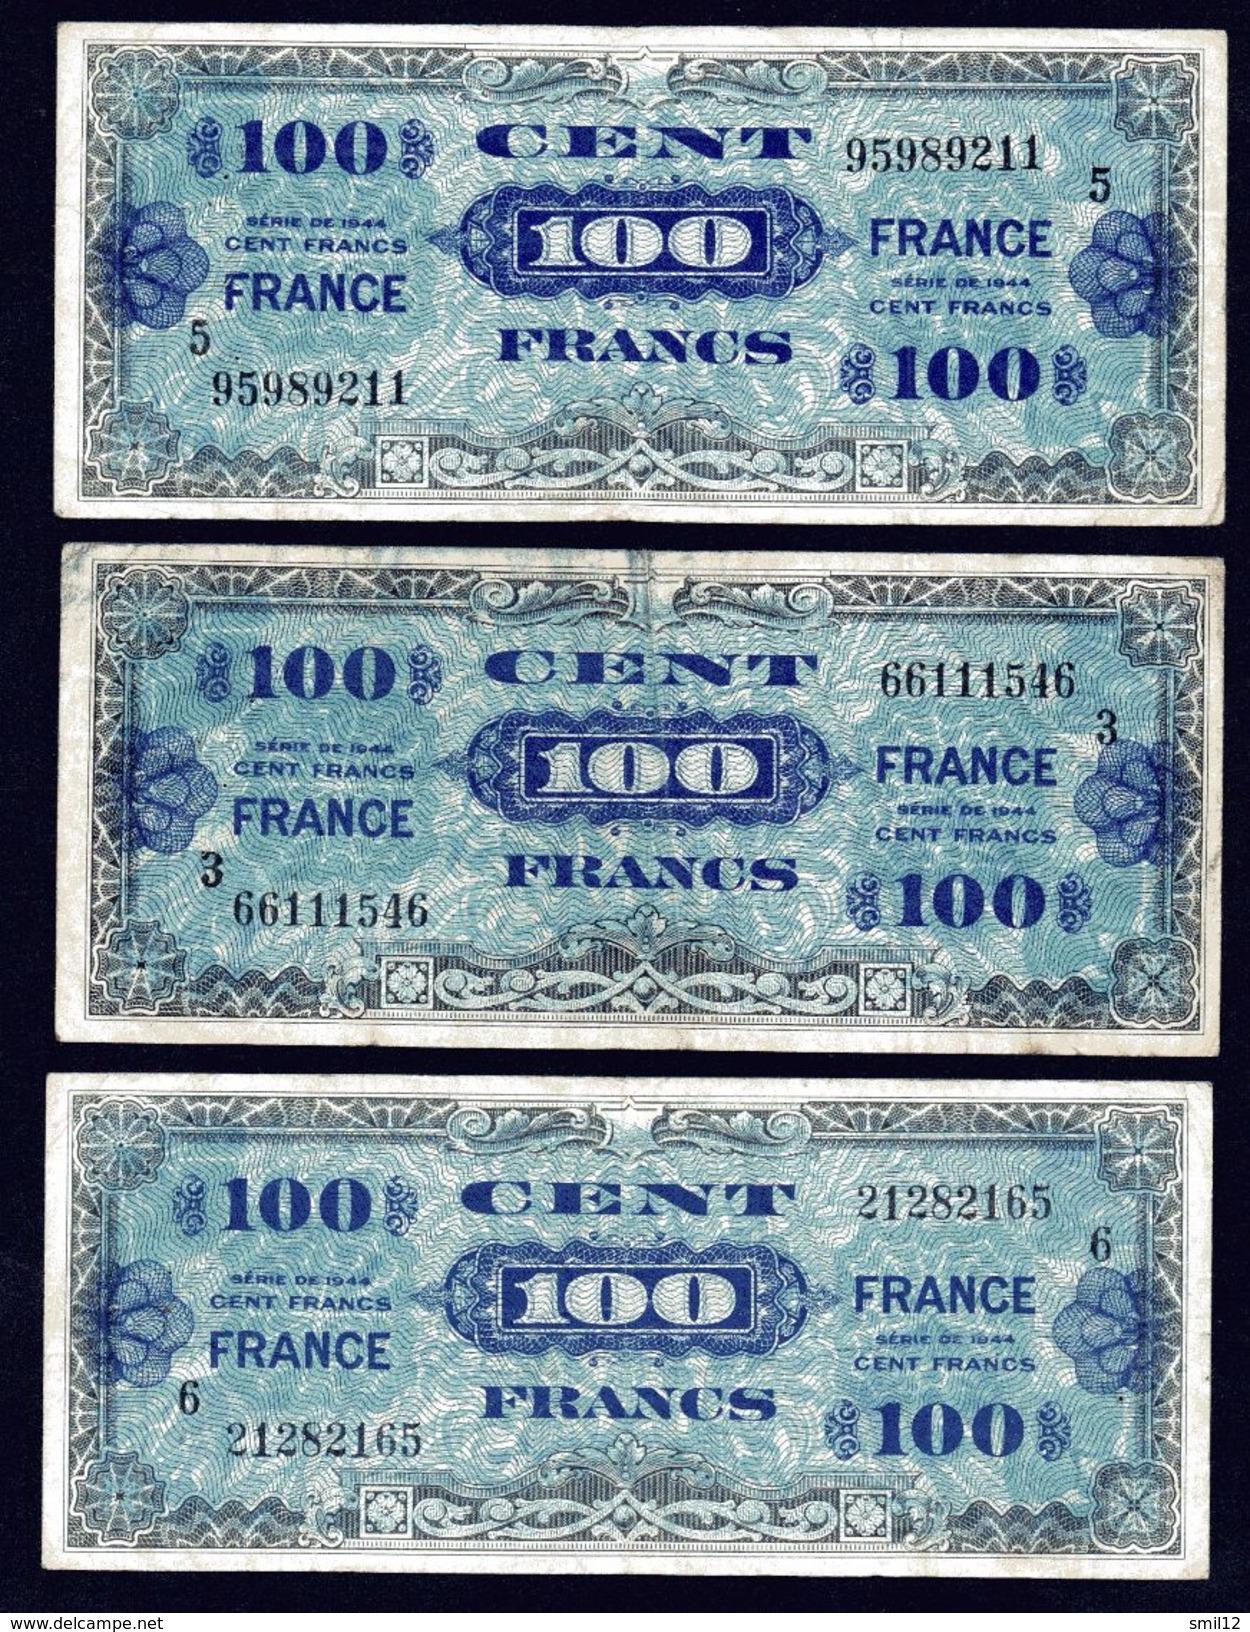 France - Lot 3X 100 Francs France (3) - Treasury